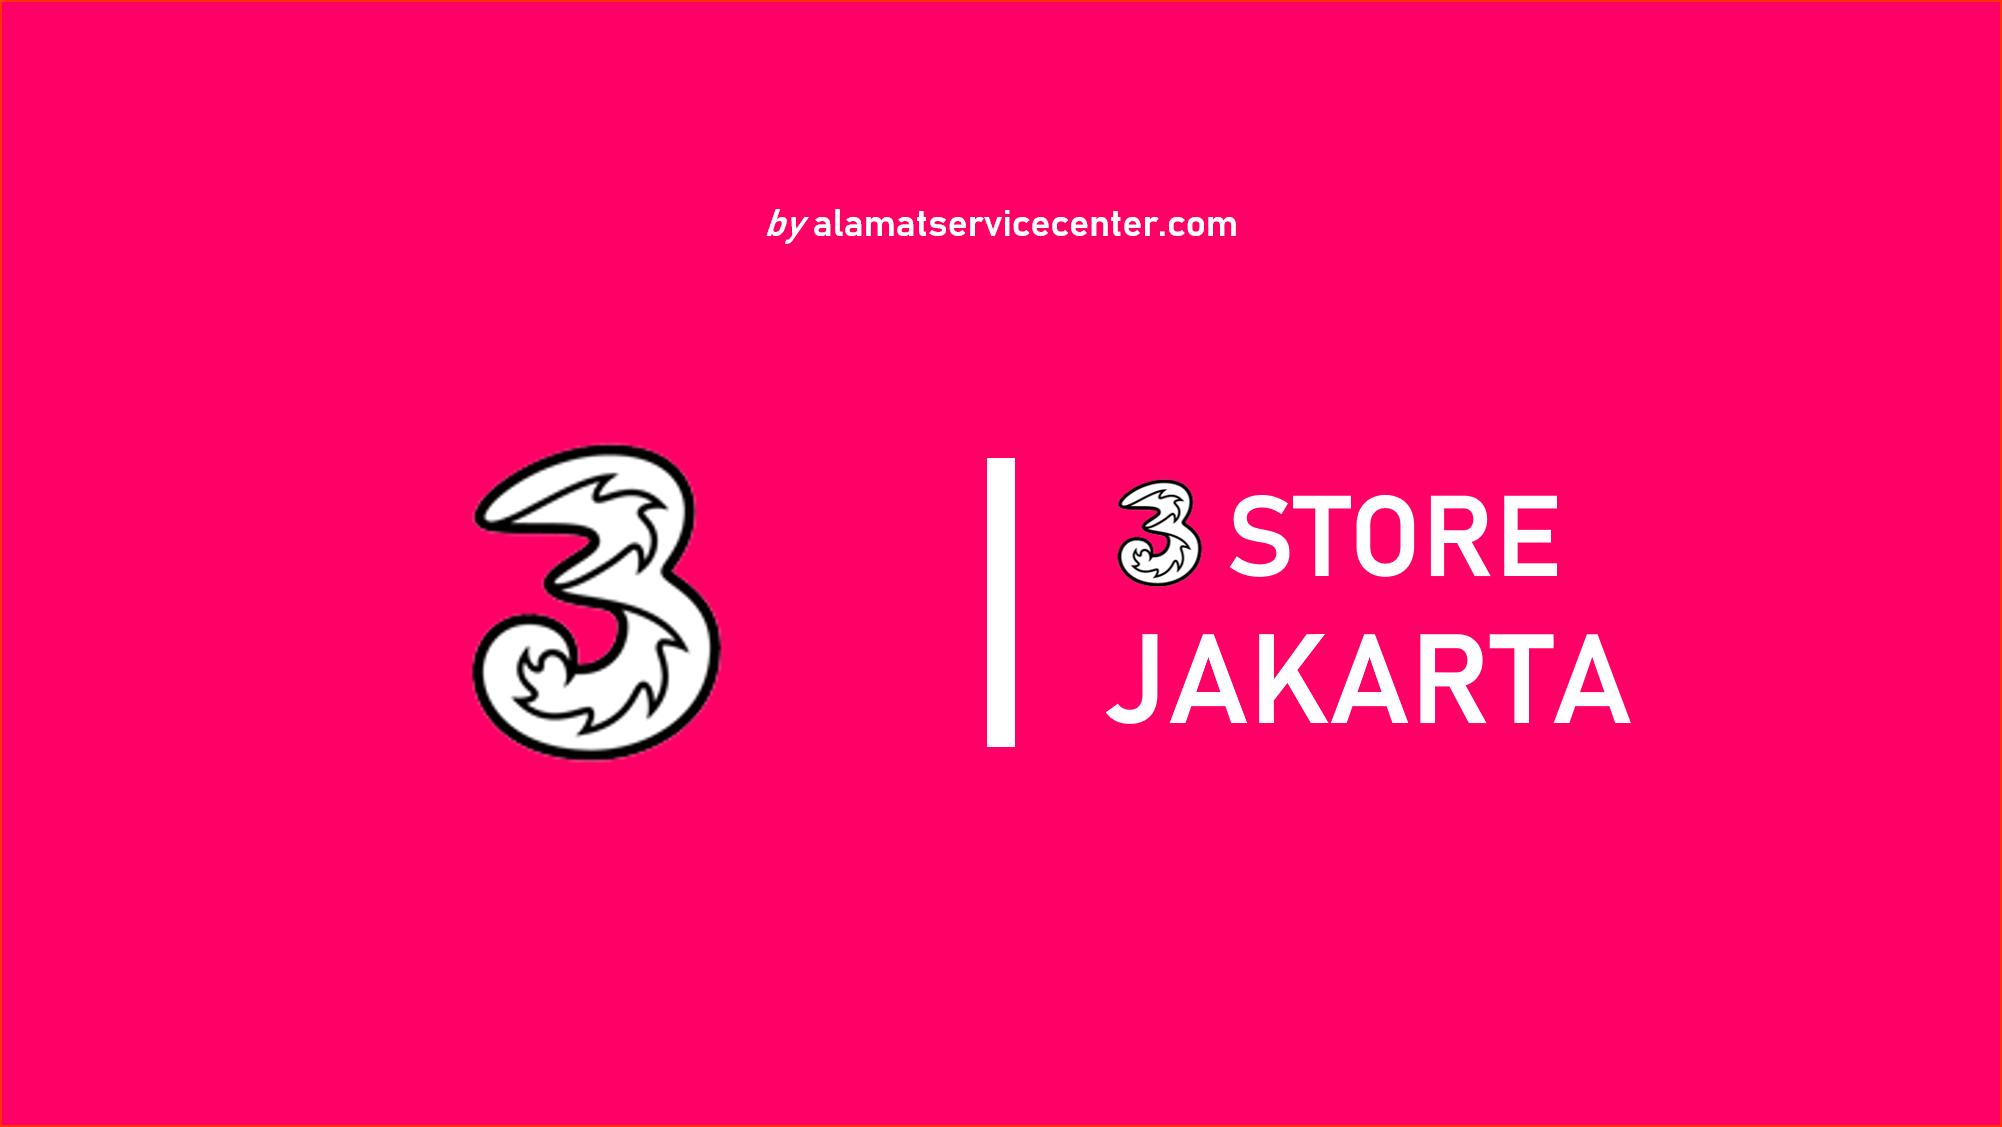 3 Store Jakarta